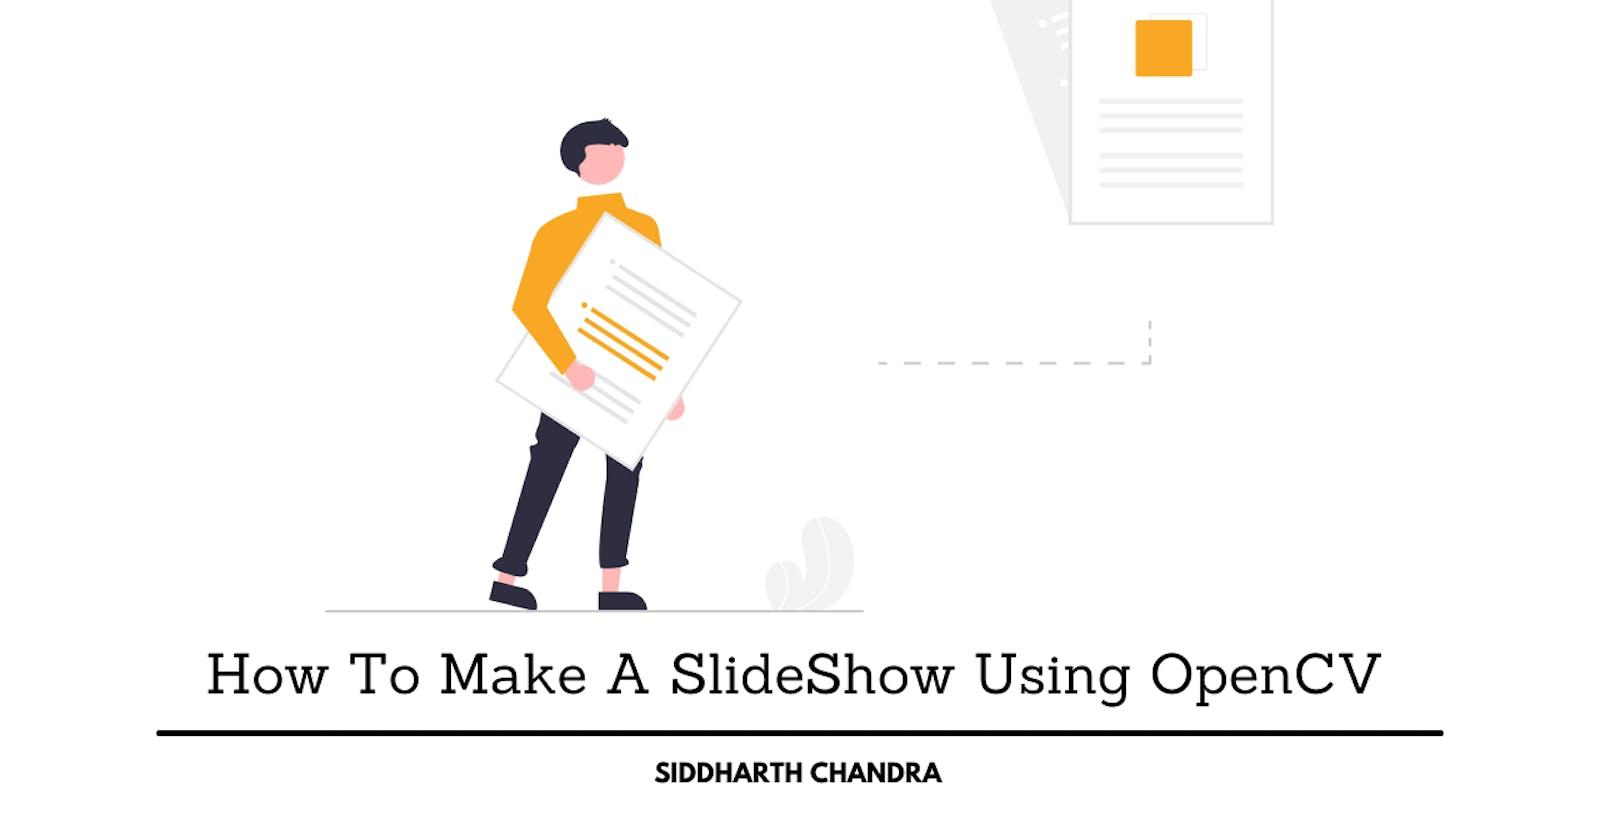 How To Make A SlideShow Using OpenCV